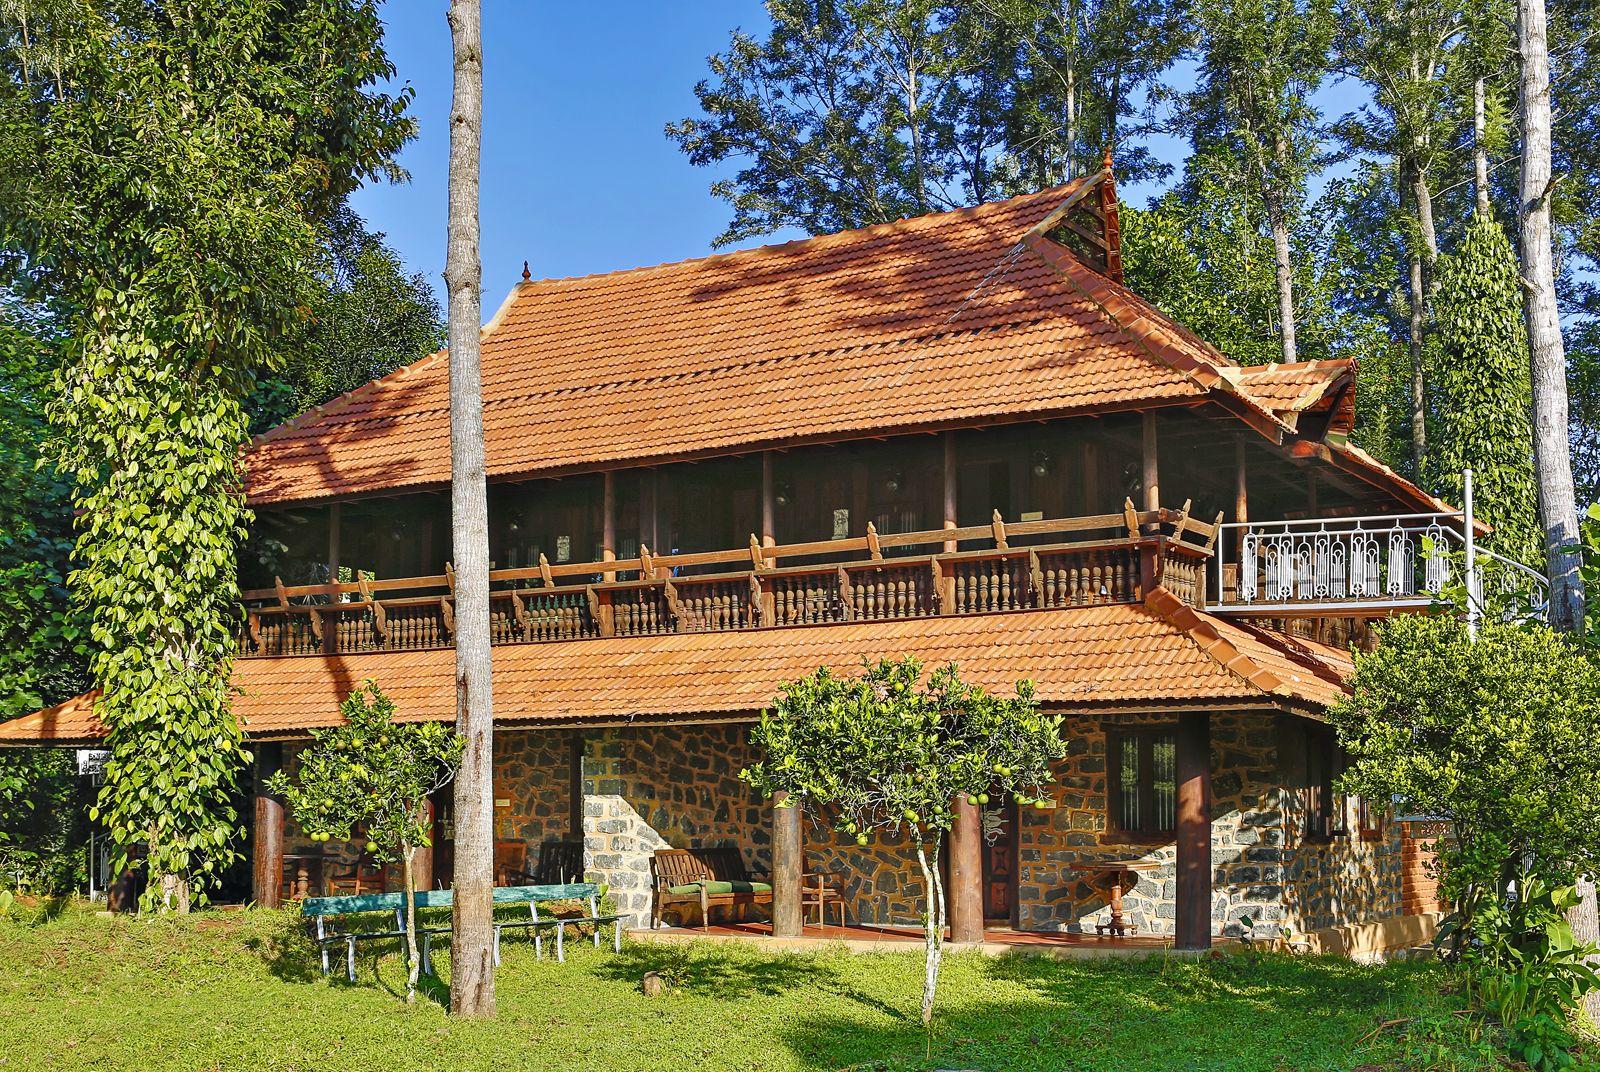 Inredning vedeldad varmvattenberedare : Heritage house at Yangsum Heritage Farm, Sikkim, India ...